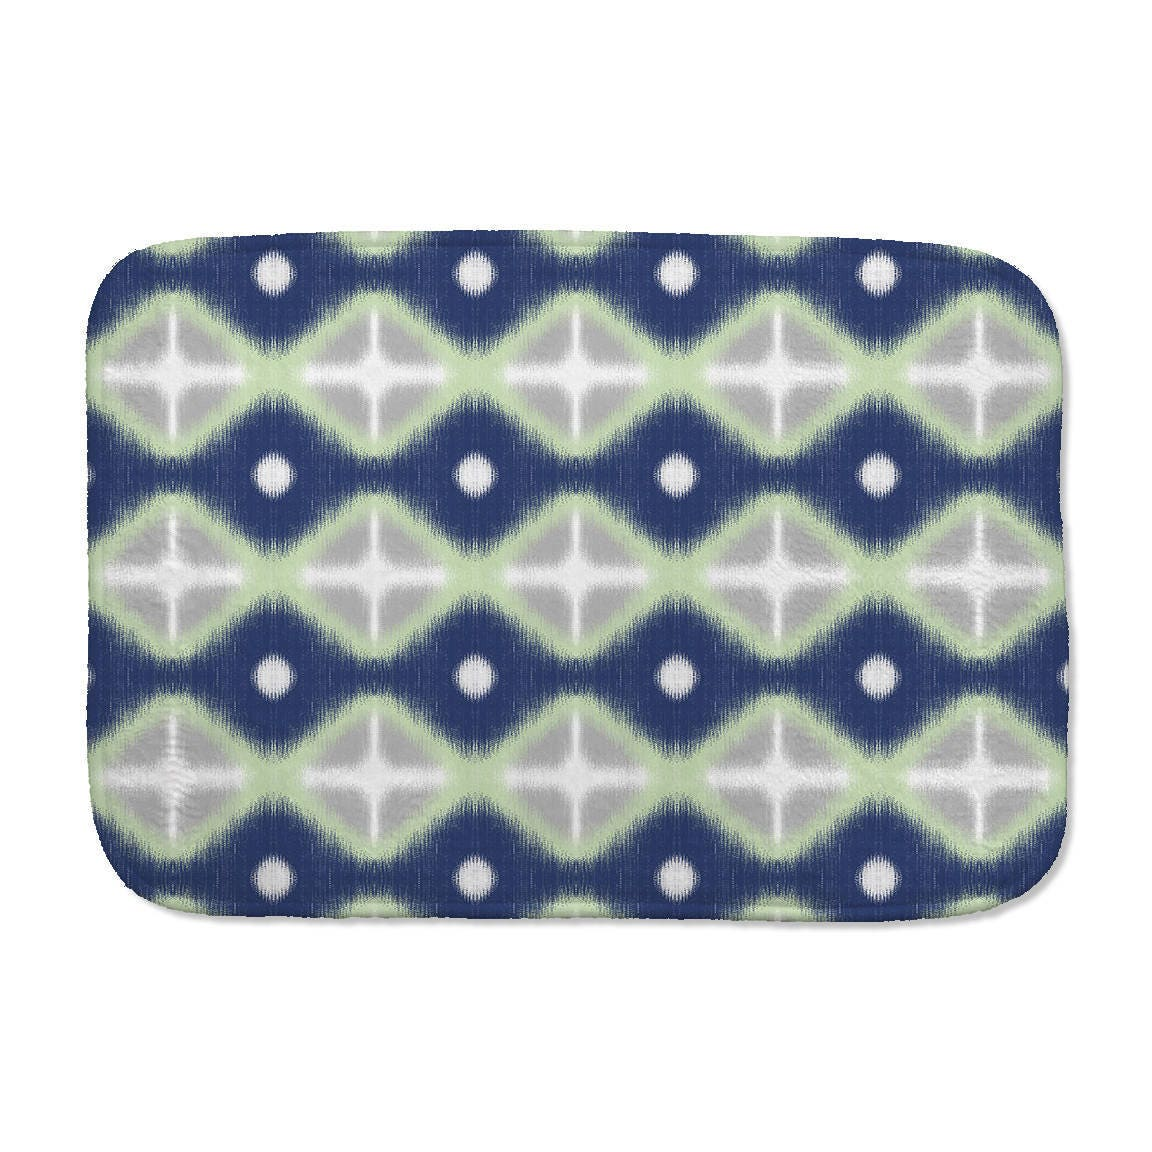 Printed Ikat Bath Mat Diamonds Bath Mat Navy Blue Green - Blue and green bath rug for bathroom decorating ideas